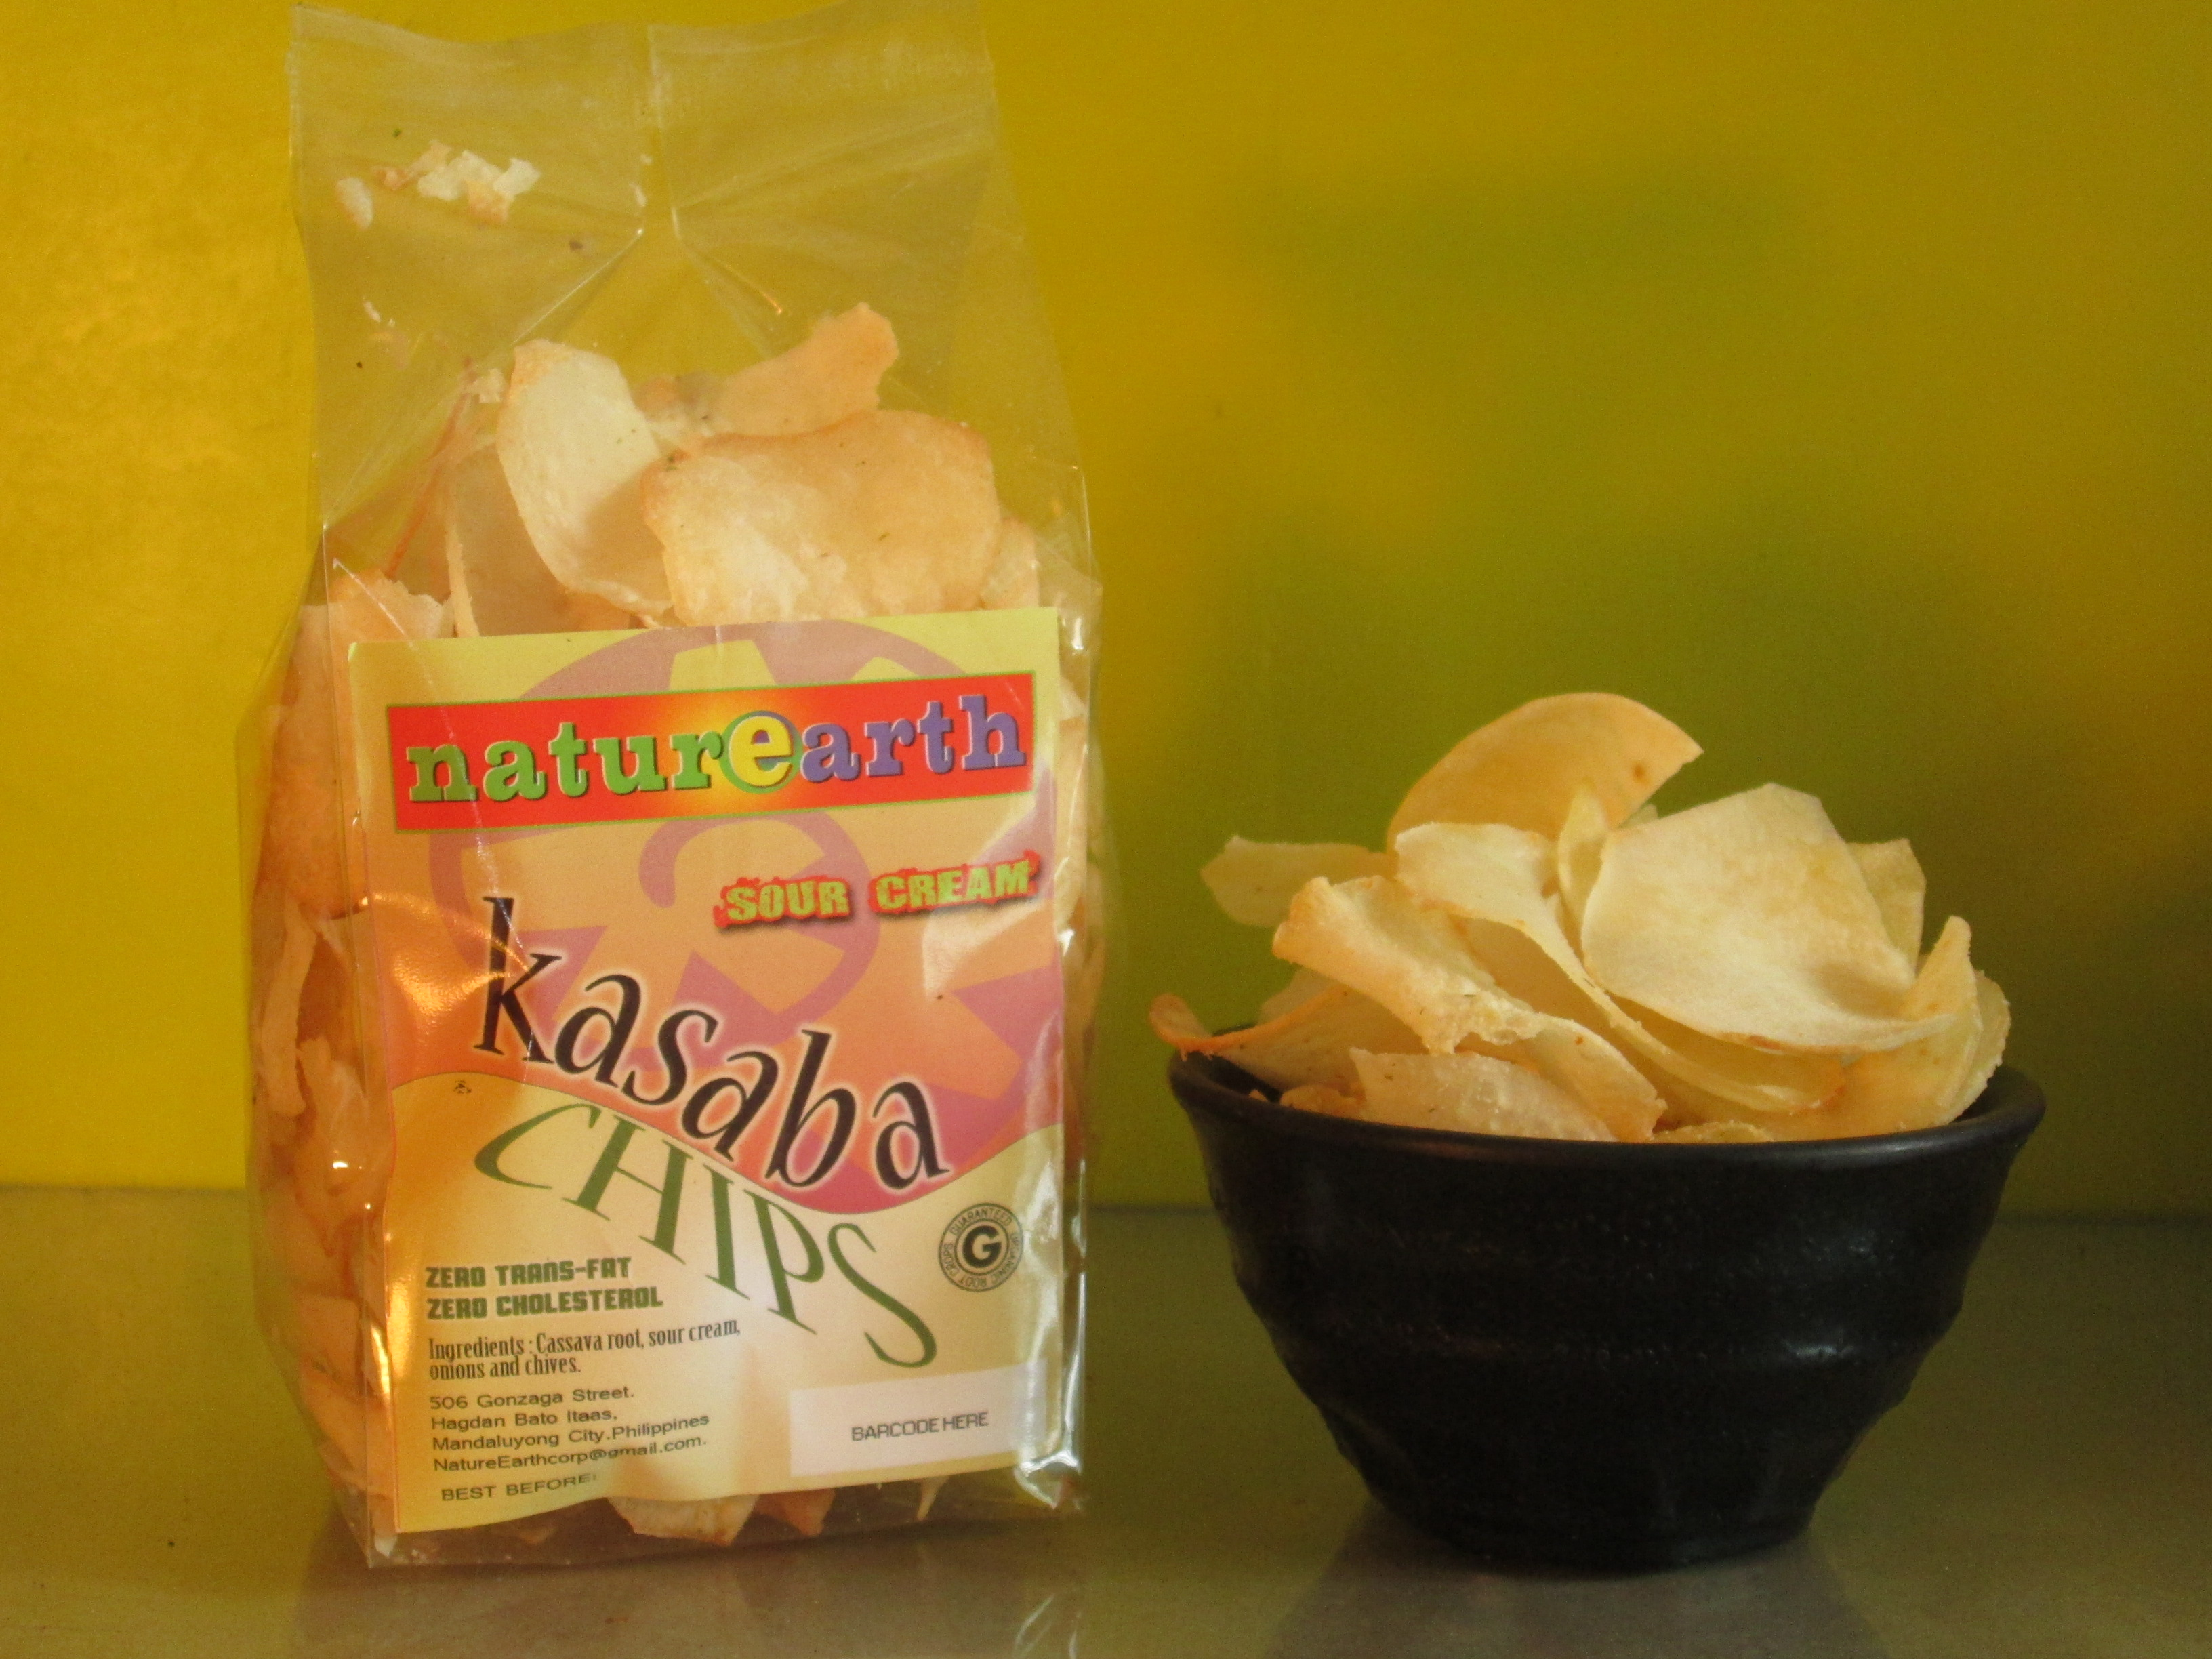 Kasaba Chips 75 grams P40.00